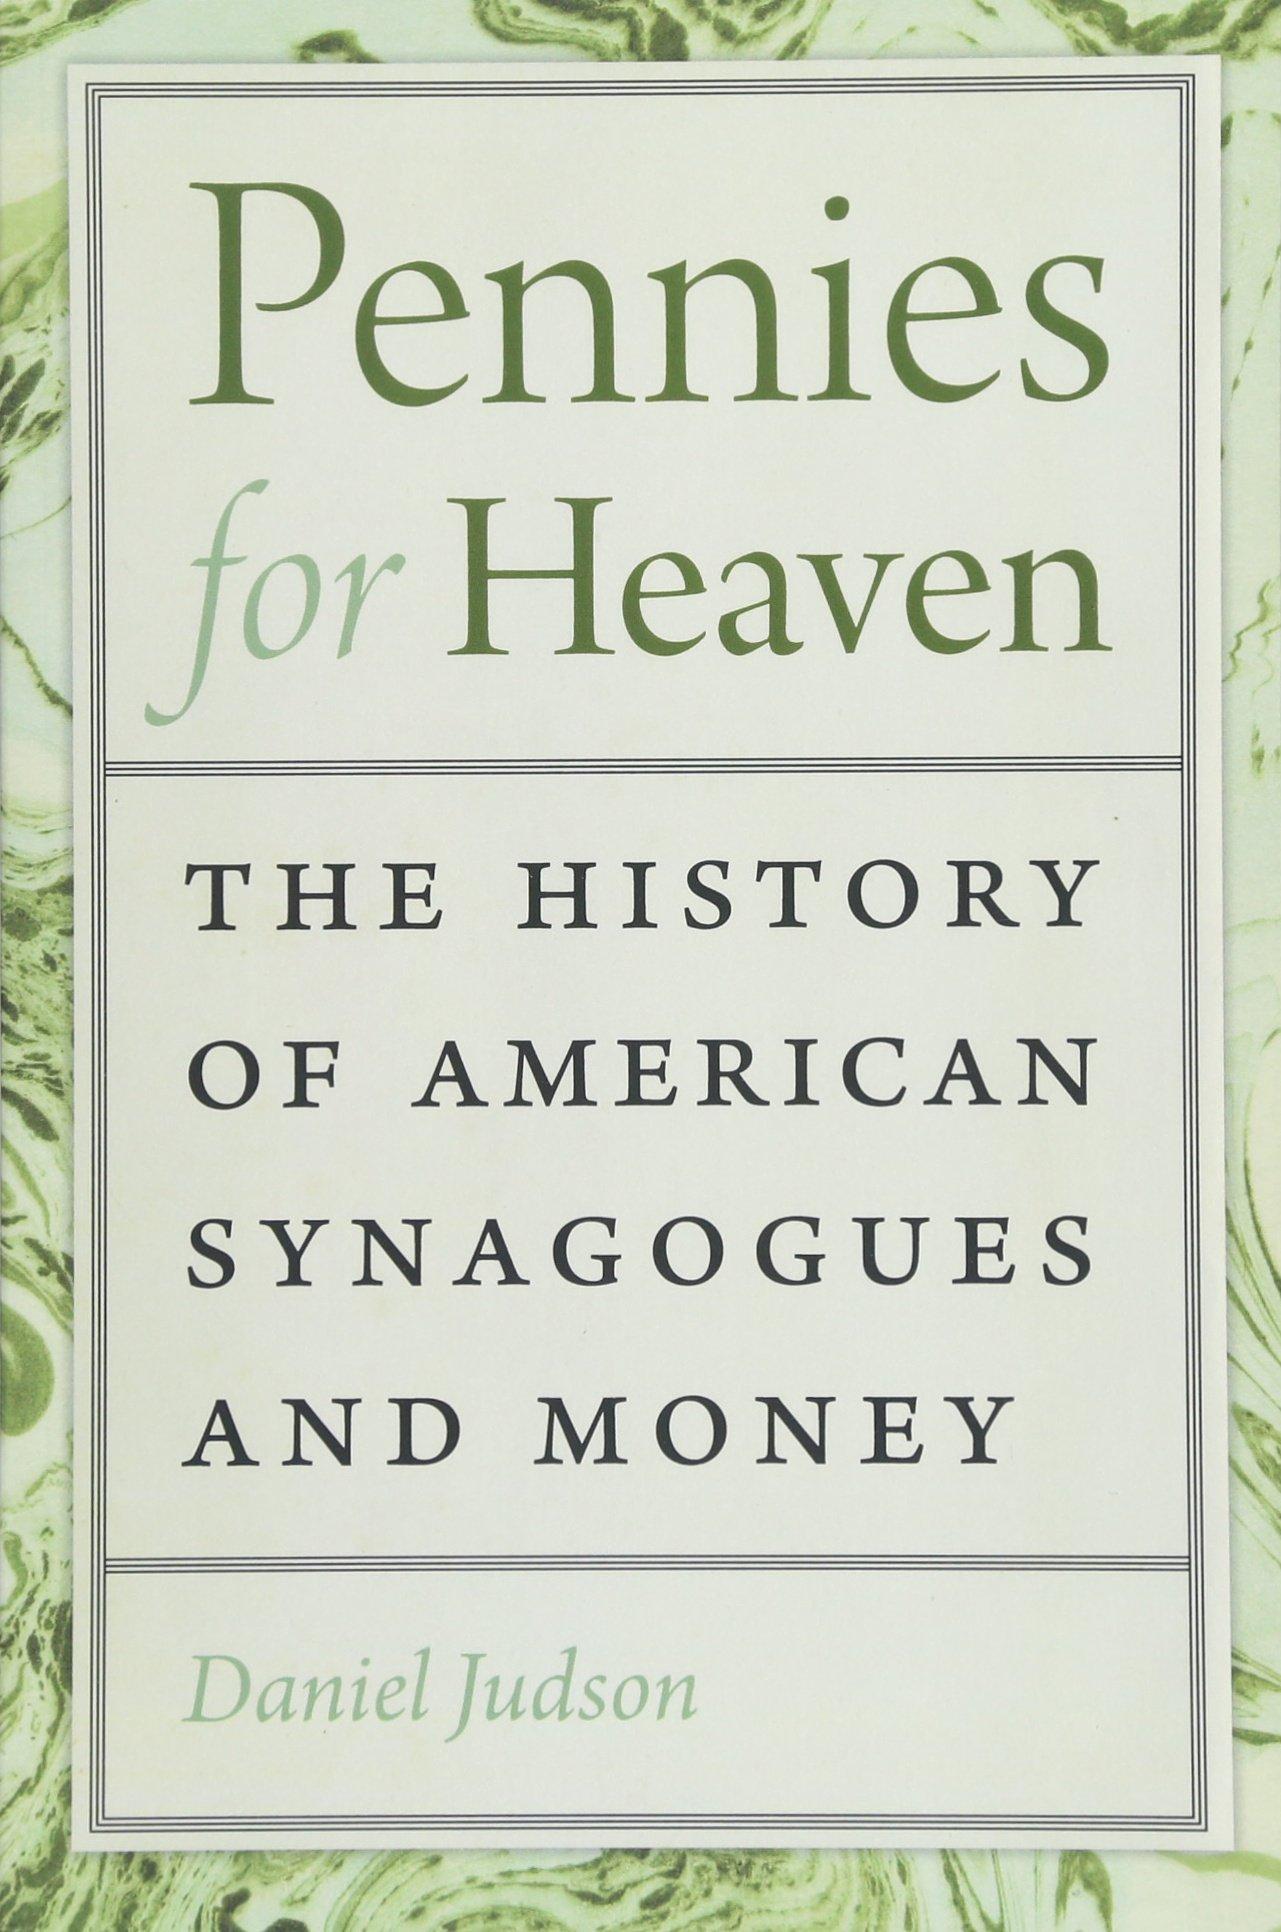 Pennies for Heaven.jpg